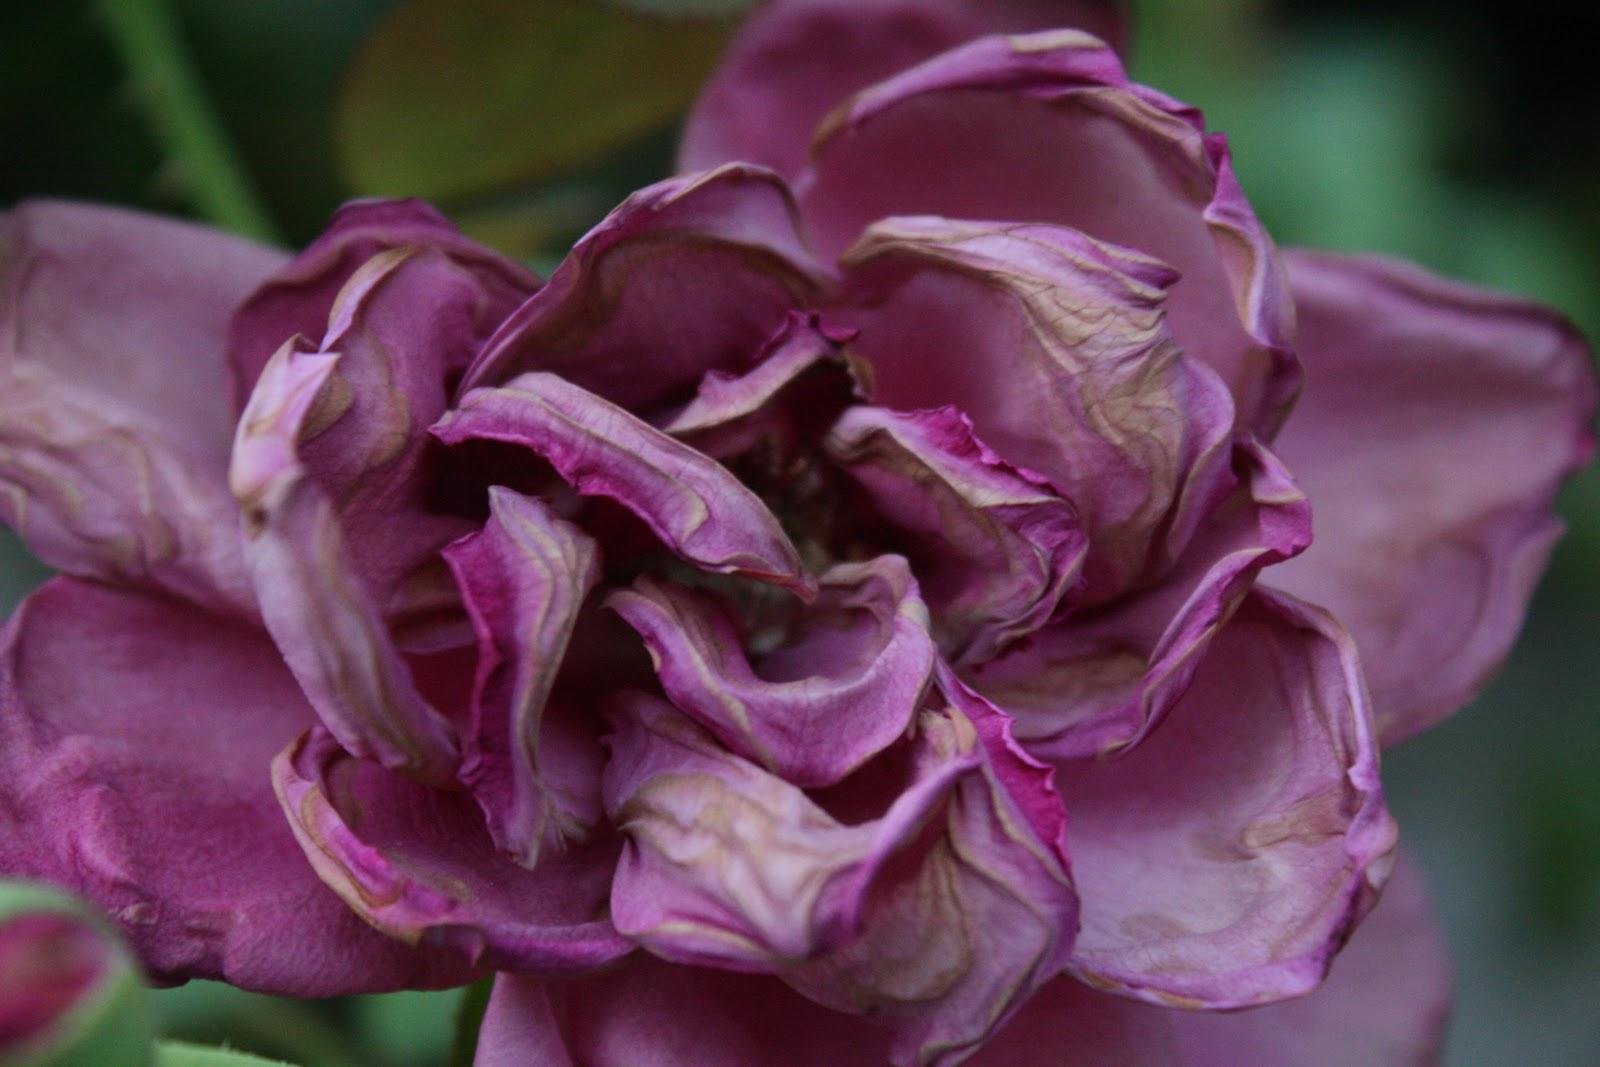 Una violetta appassita